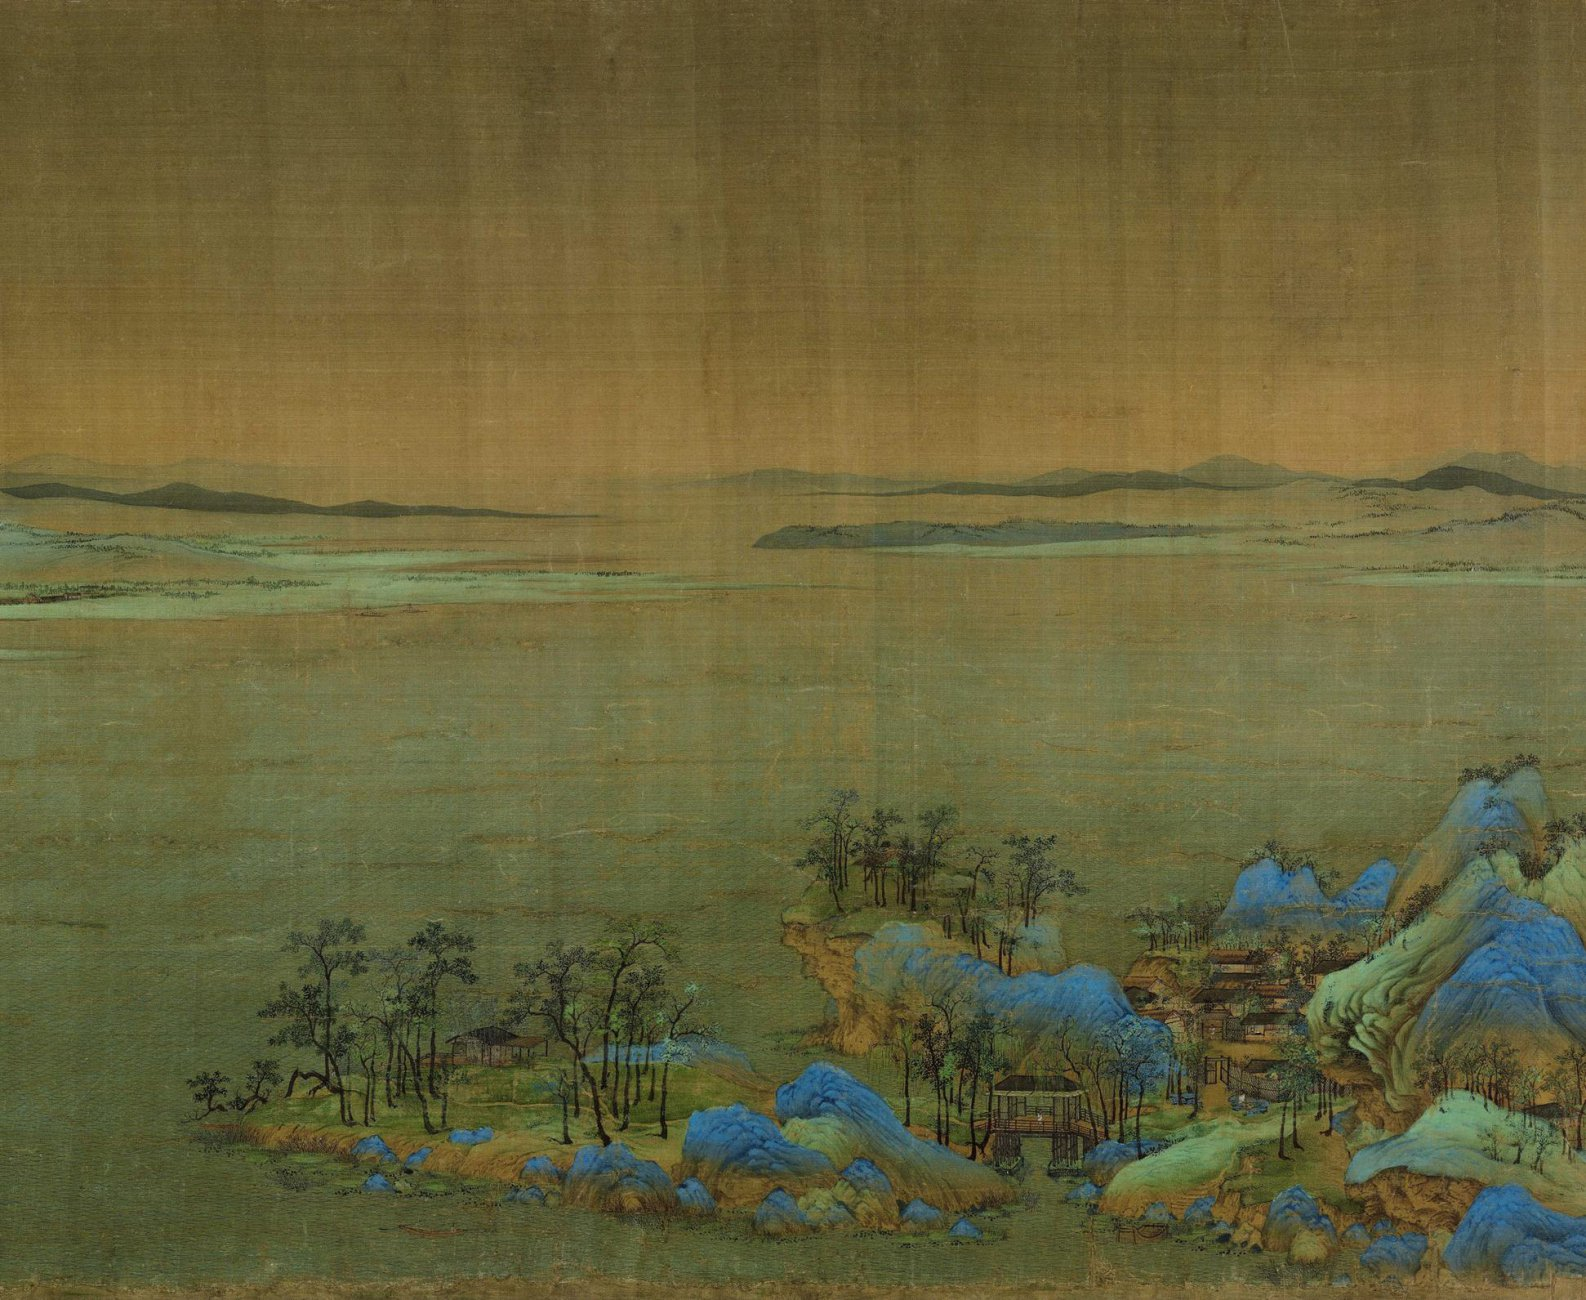 5.1e_Wang_Ximeng._A_Thousand_Li_of_Rivers_and_Mountains..jpg